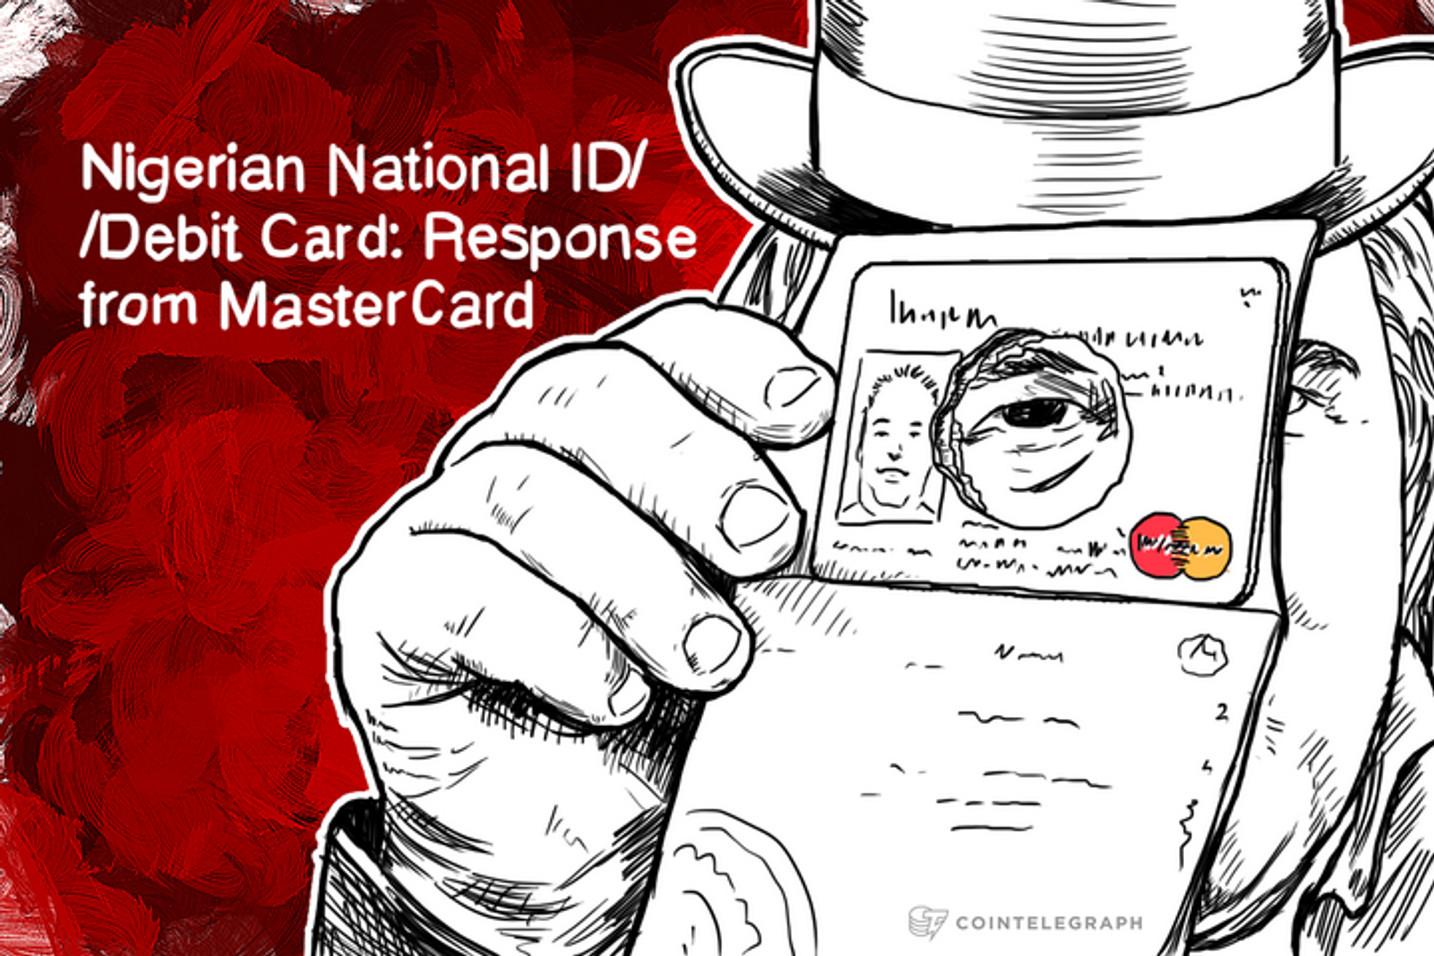 Nigerian National ID/Debit Card: Response from MasterCard